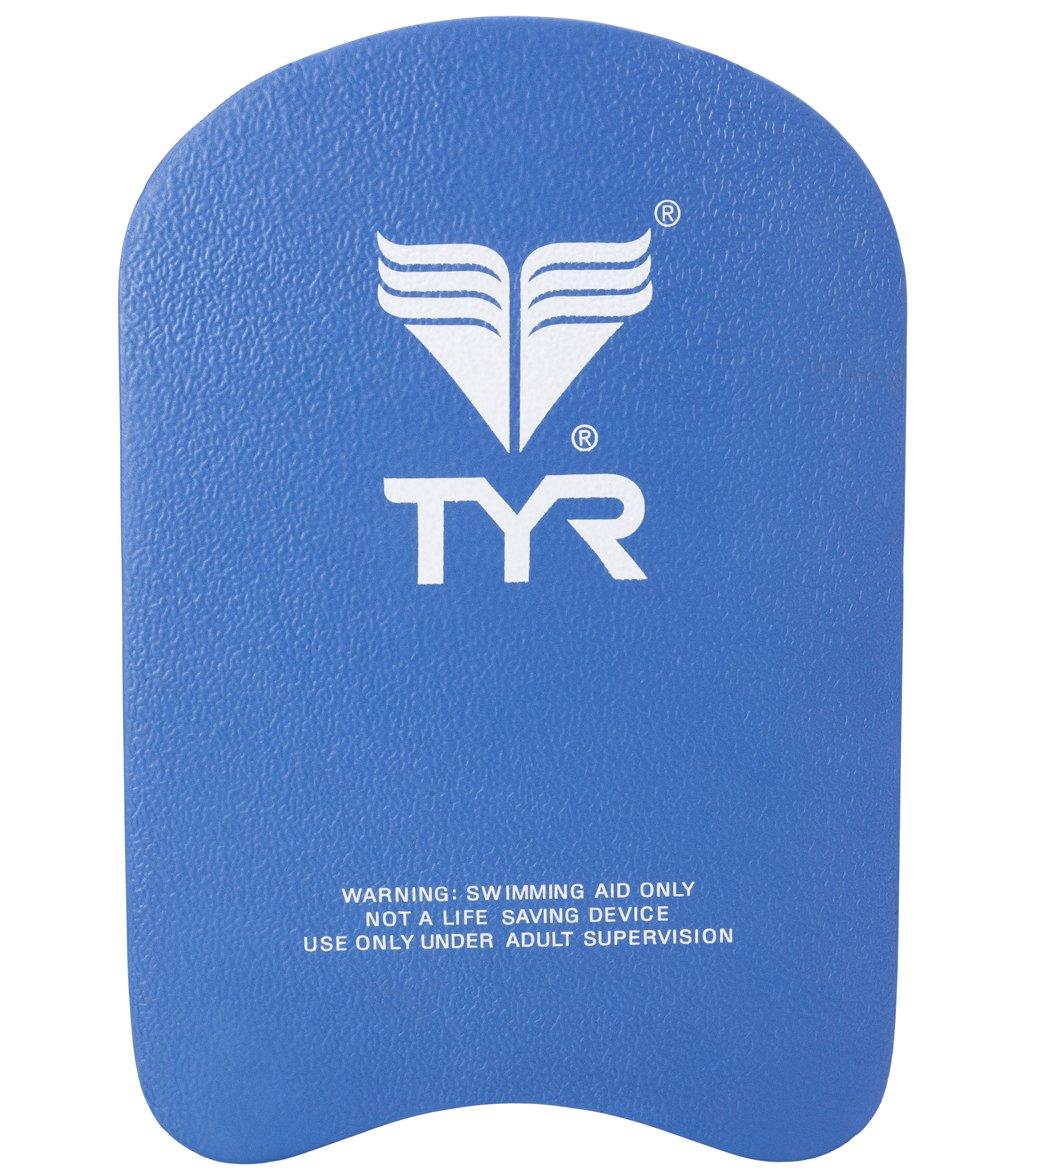 tyr jr kickboard at swimoutlet com